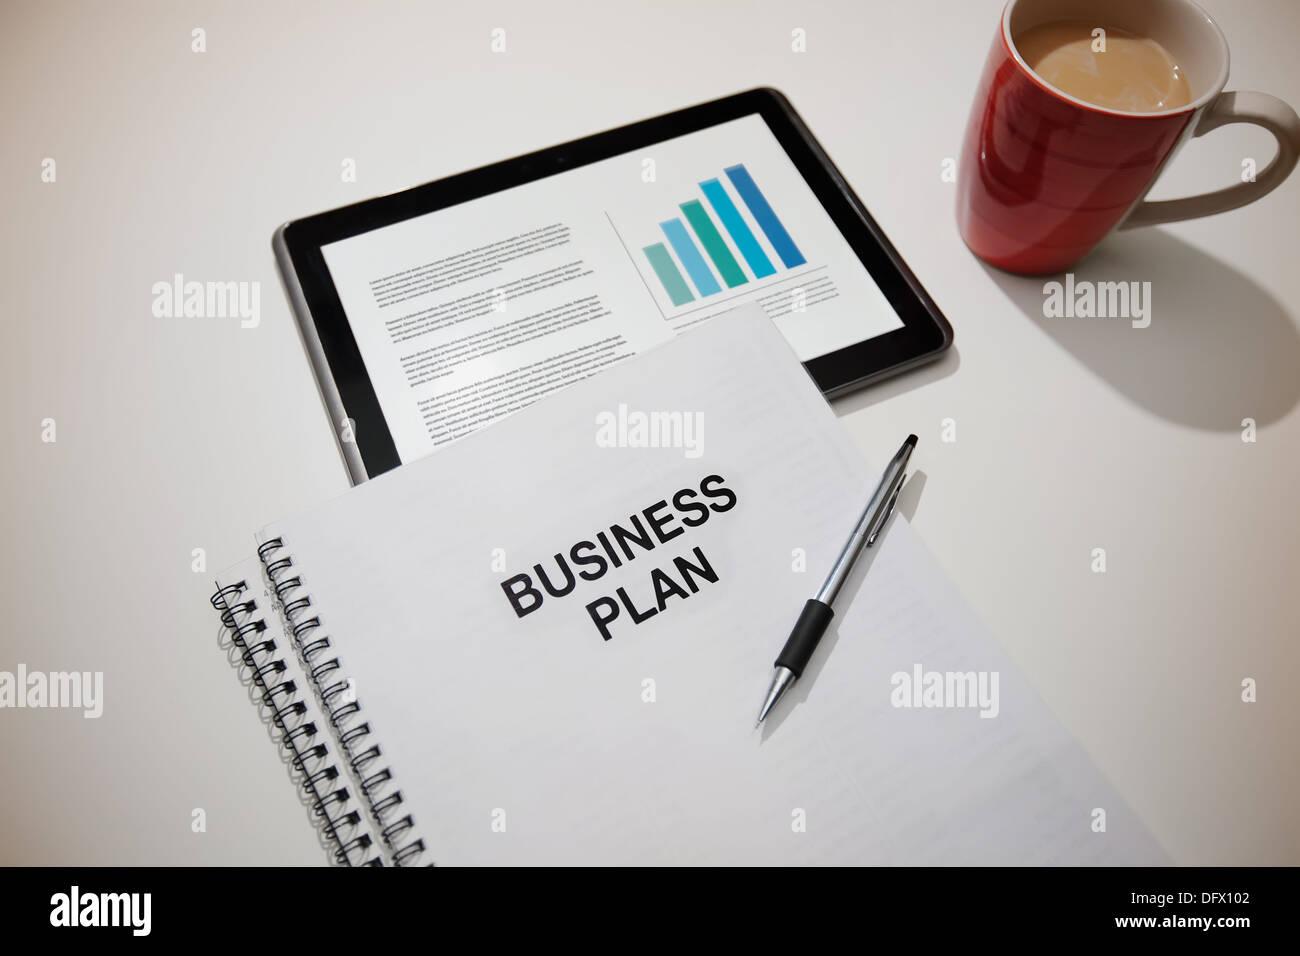 Entrepreneurial business plan preparation. - Stock Image